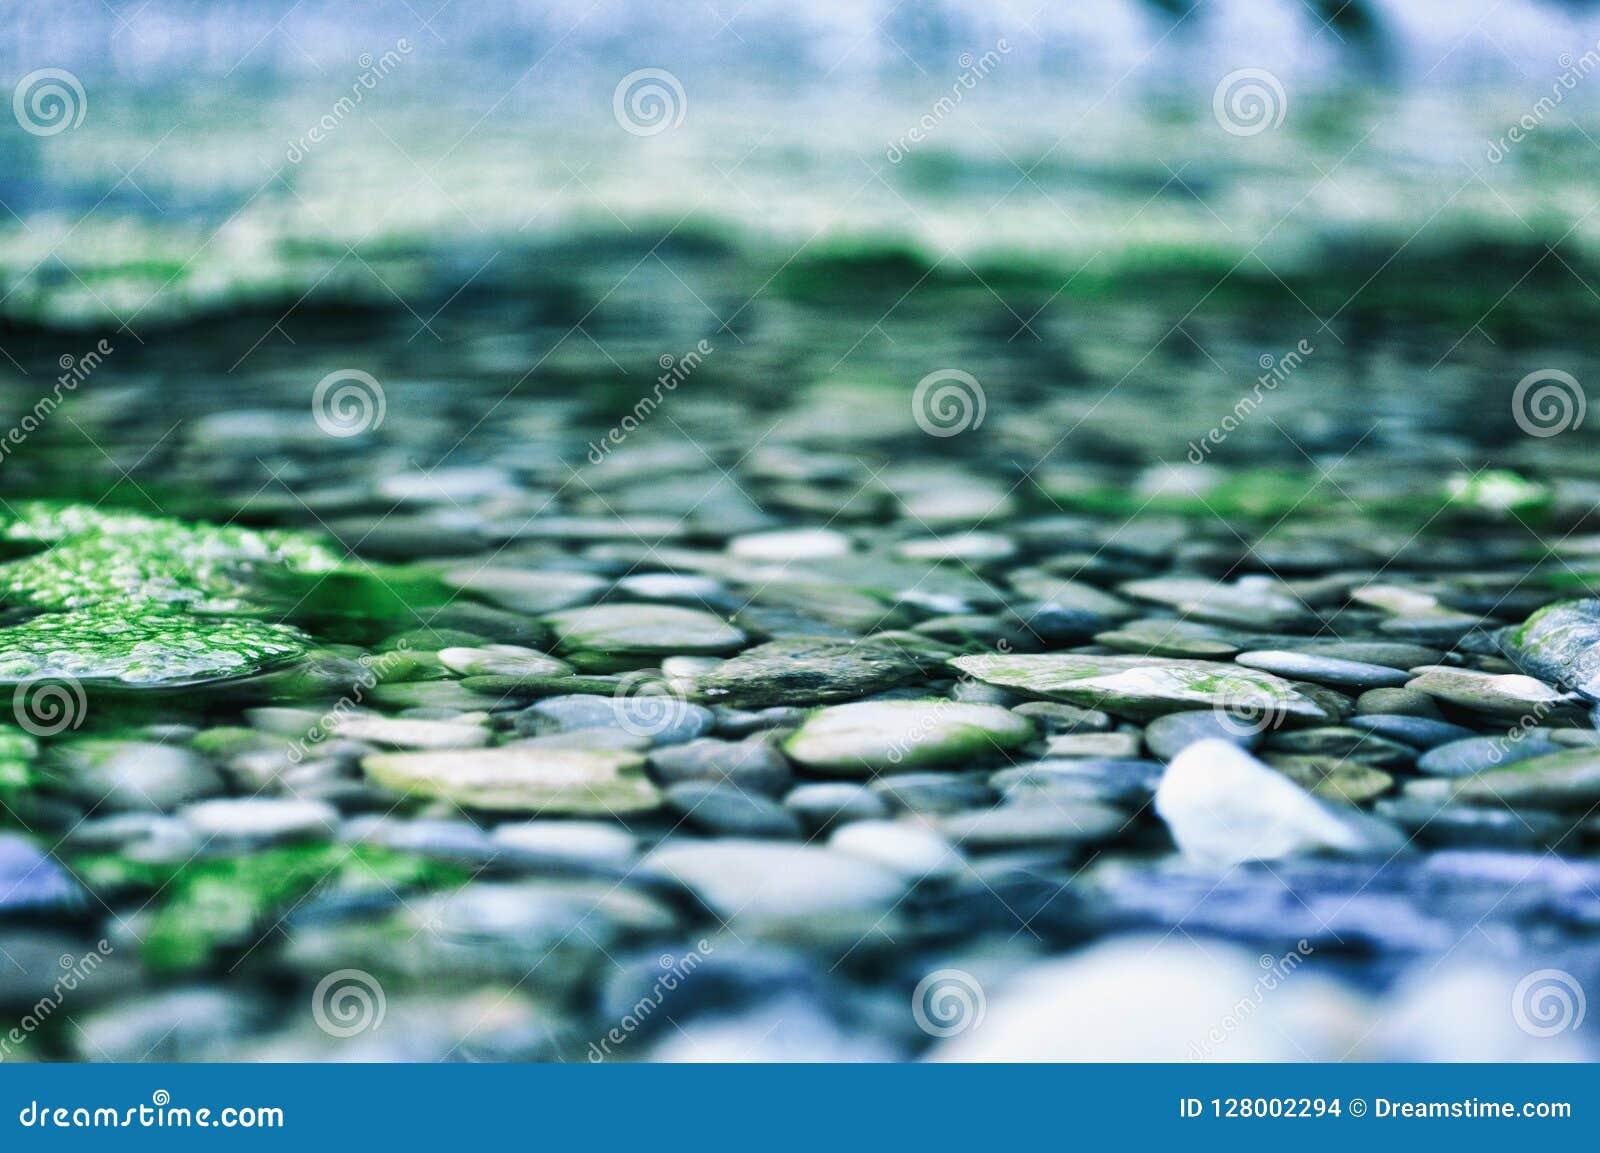 Stones, river, nature, chill, relax yoga brackground